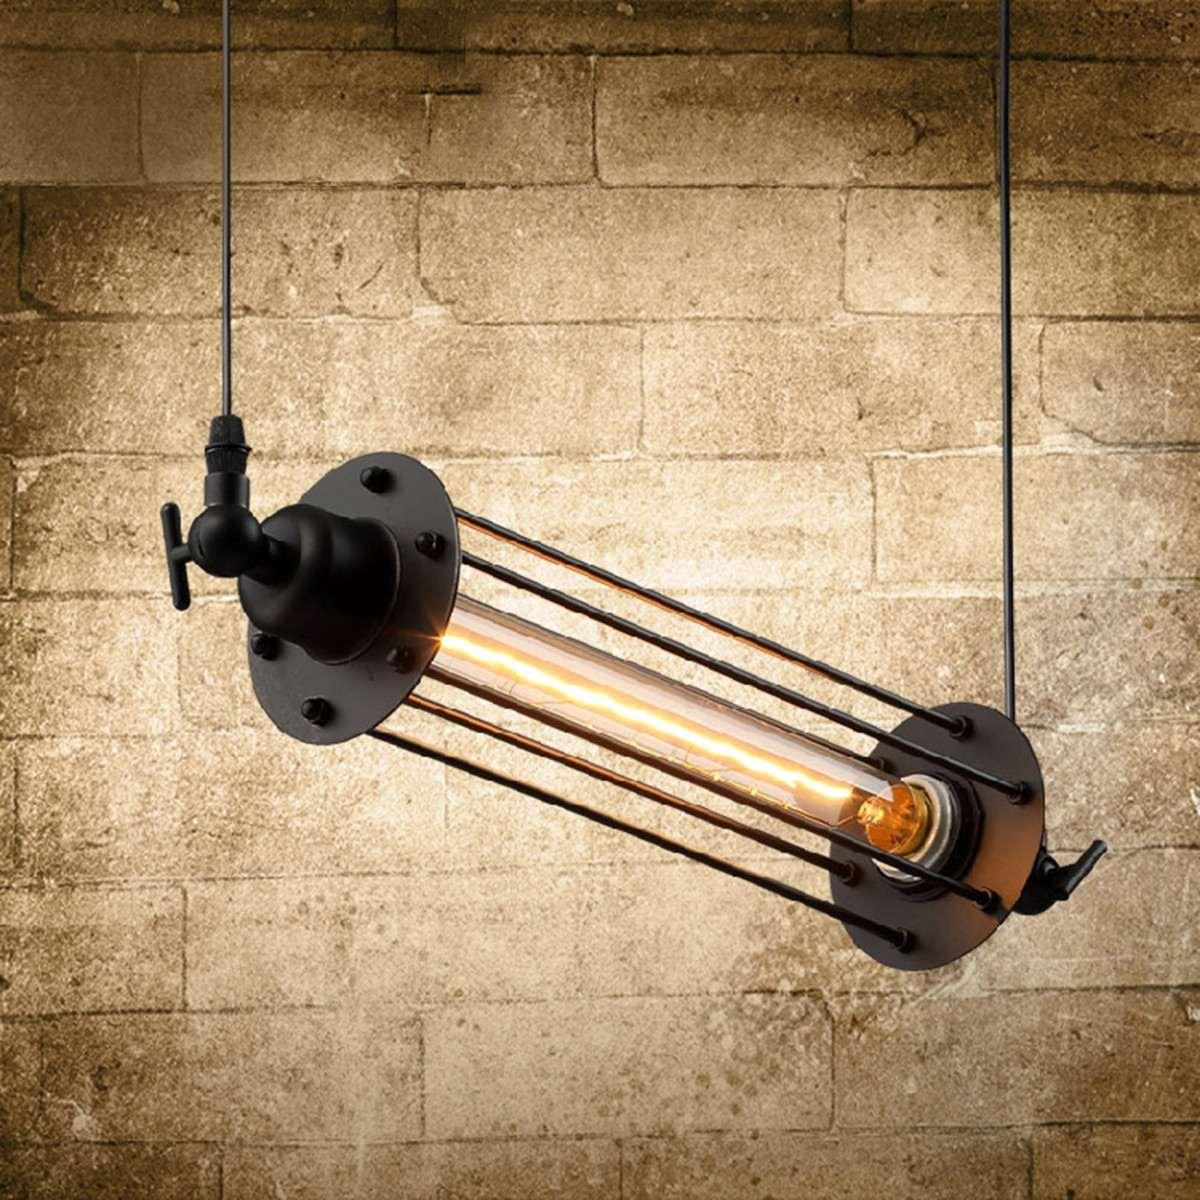 Industrial Retro Vintage Flute Ceiling Lamp E27 Hanging Pendant Light Cafe Bar Restaurant Indoor Lighting Decor AC 110-240V zg9046 pendant light ac 110 240v